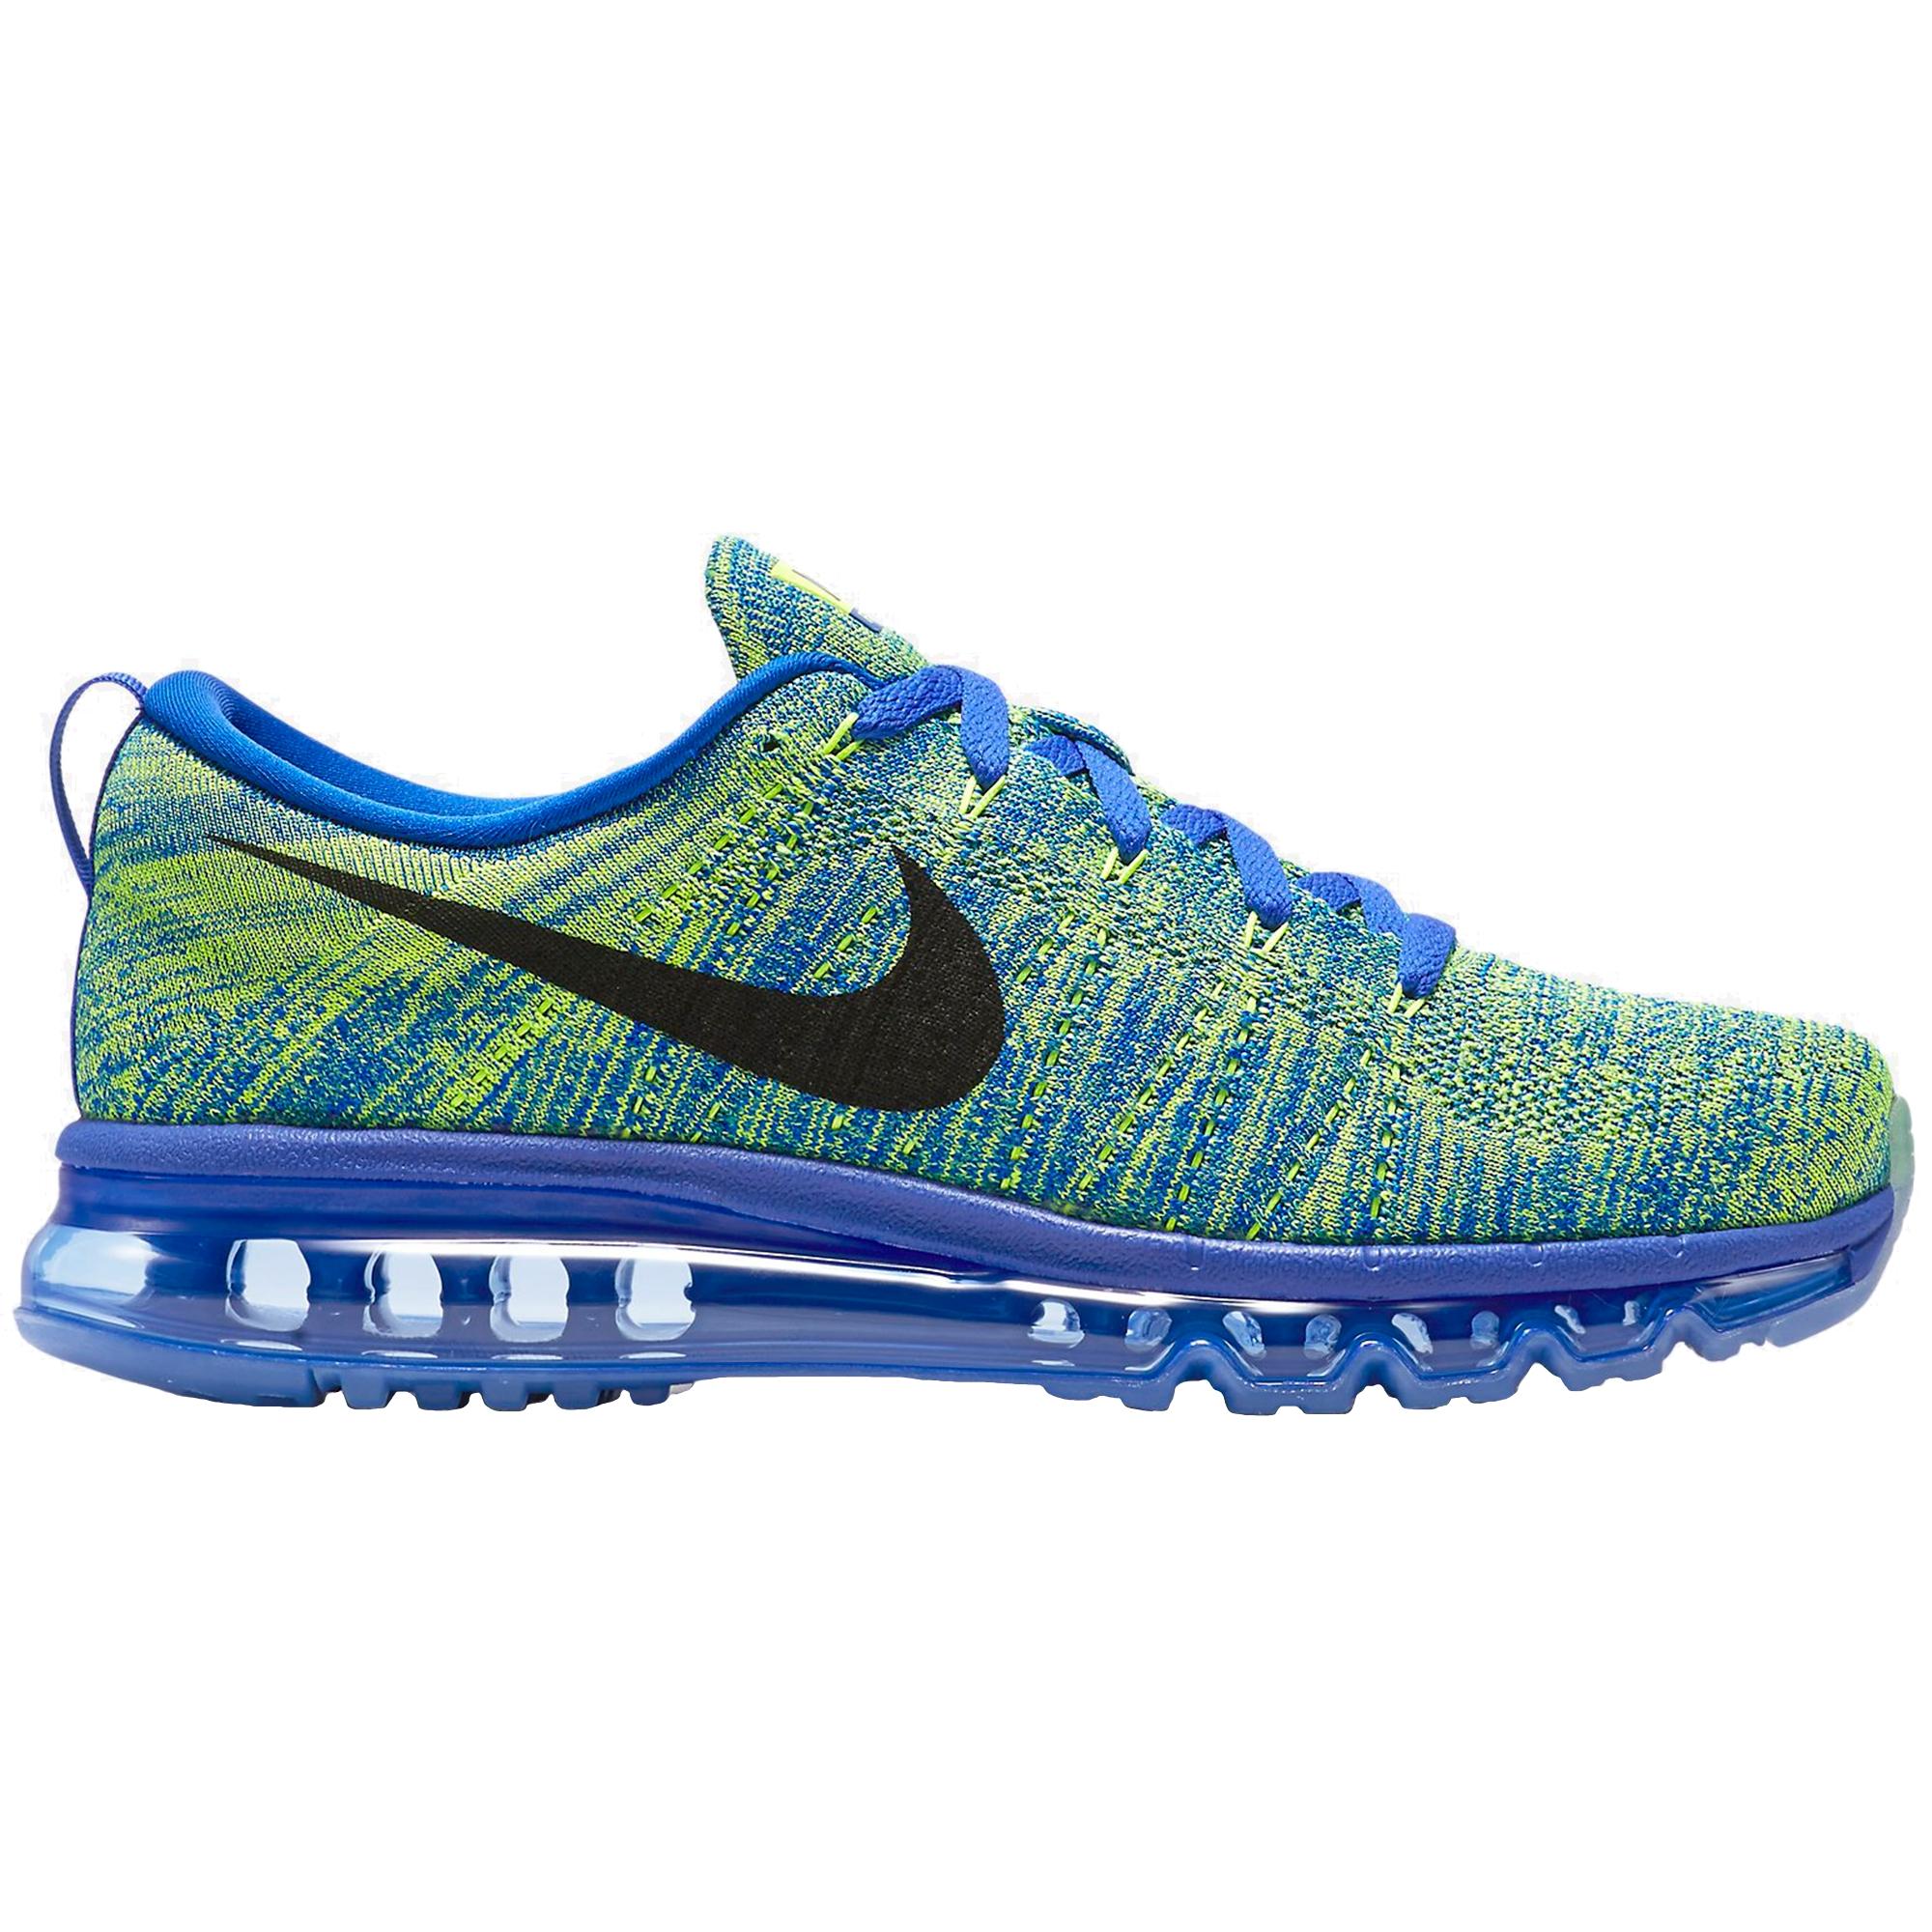 the latest 7de82 c31c9 ... newest a9121 59370 ... best Nike Flyknit Max Erkek Spor Ayakkabı .. ...